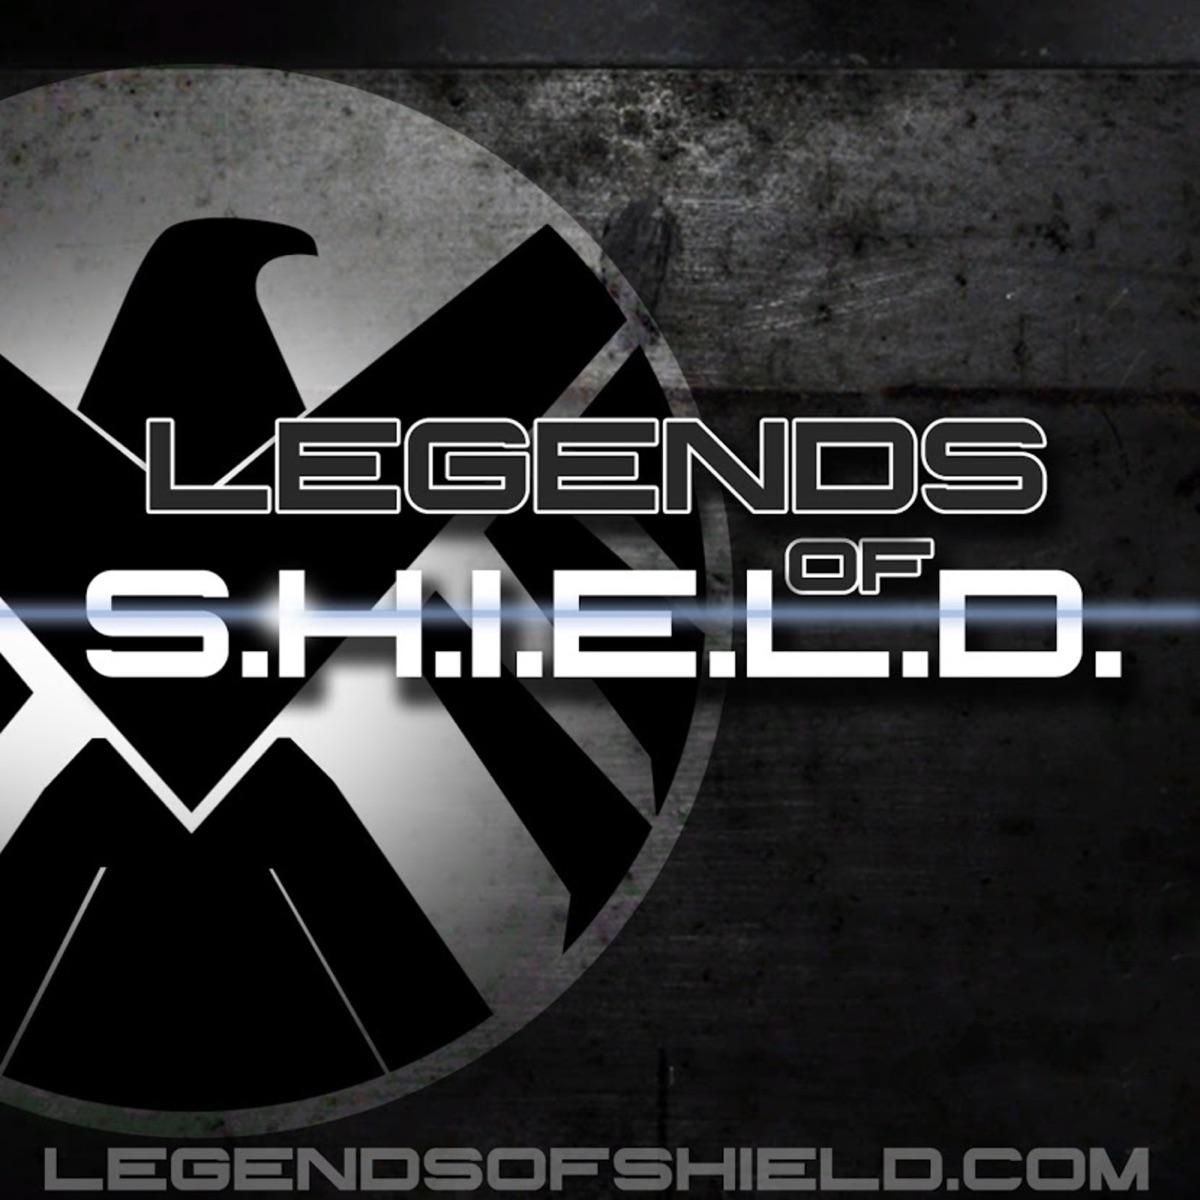 Legends of S.H.I.E.L.D.: An Unofficial Marvel TV & Film Fan Podcast